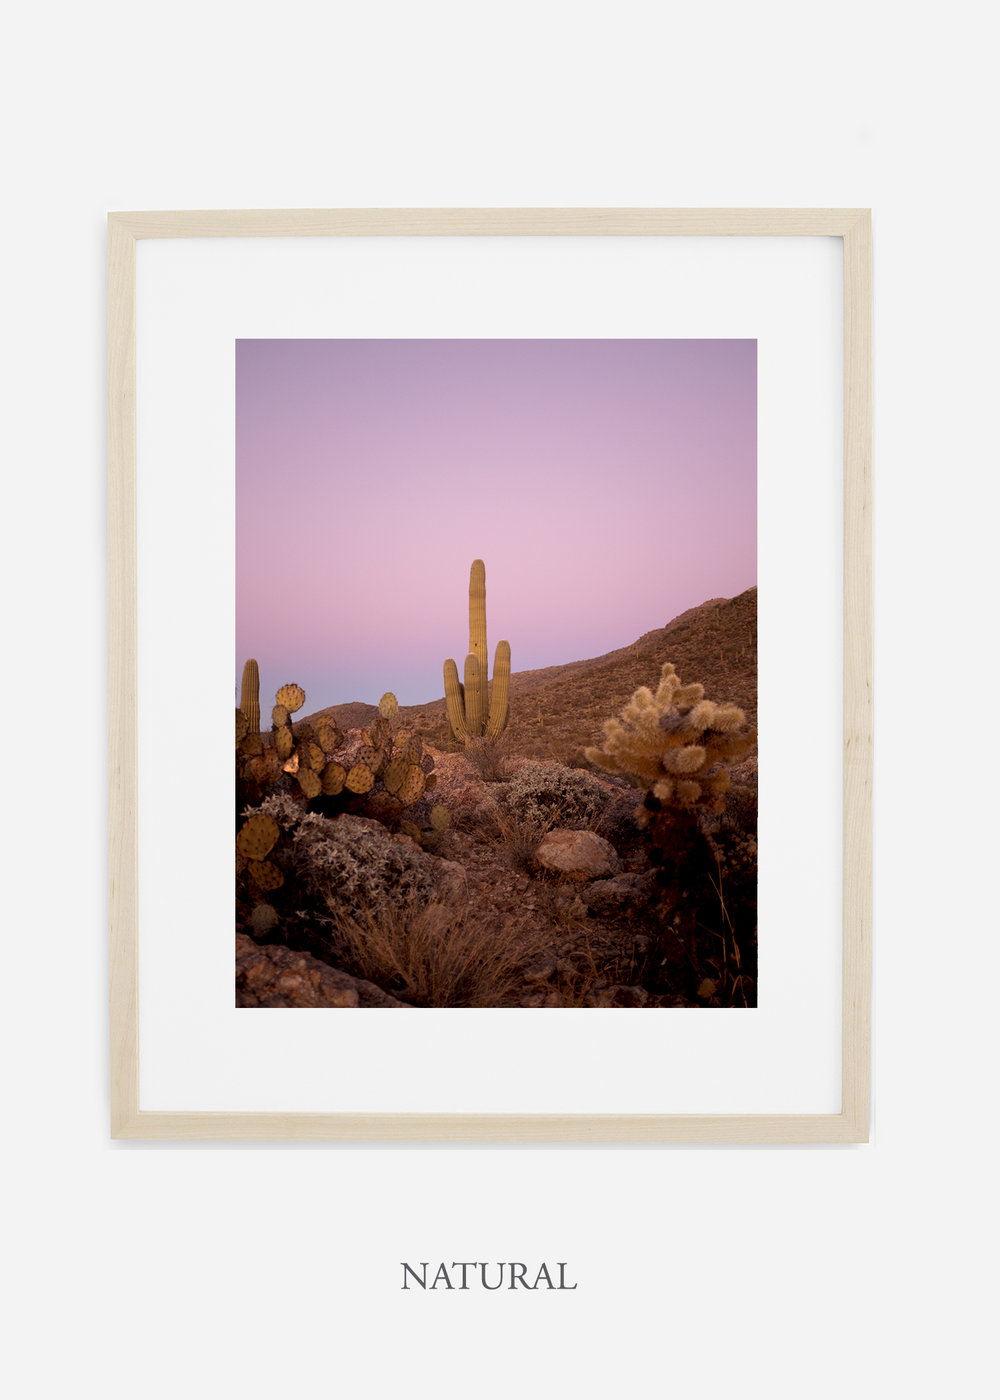 naturalframe-saguaroNo.10-wildercalifornia-art-wallart-cactusprint-homedecor-prints-arizona-botanical-artwork-interiordesign.jpg